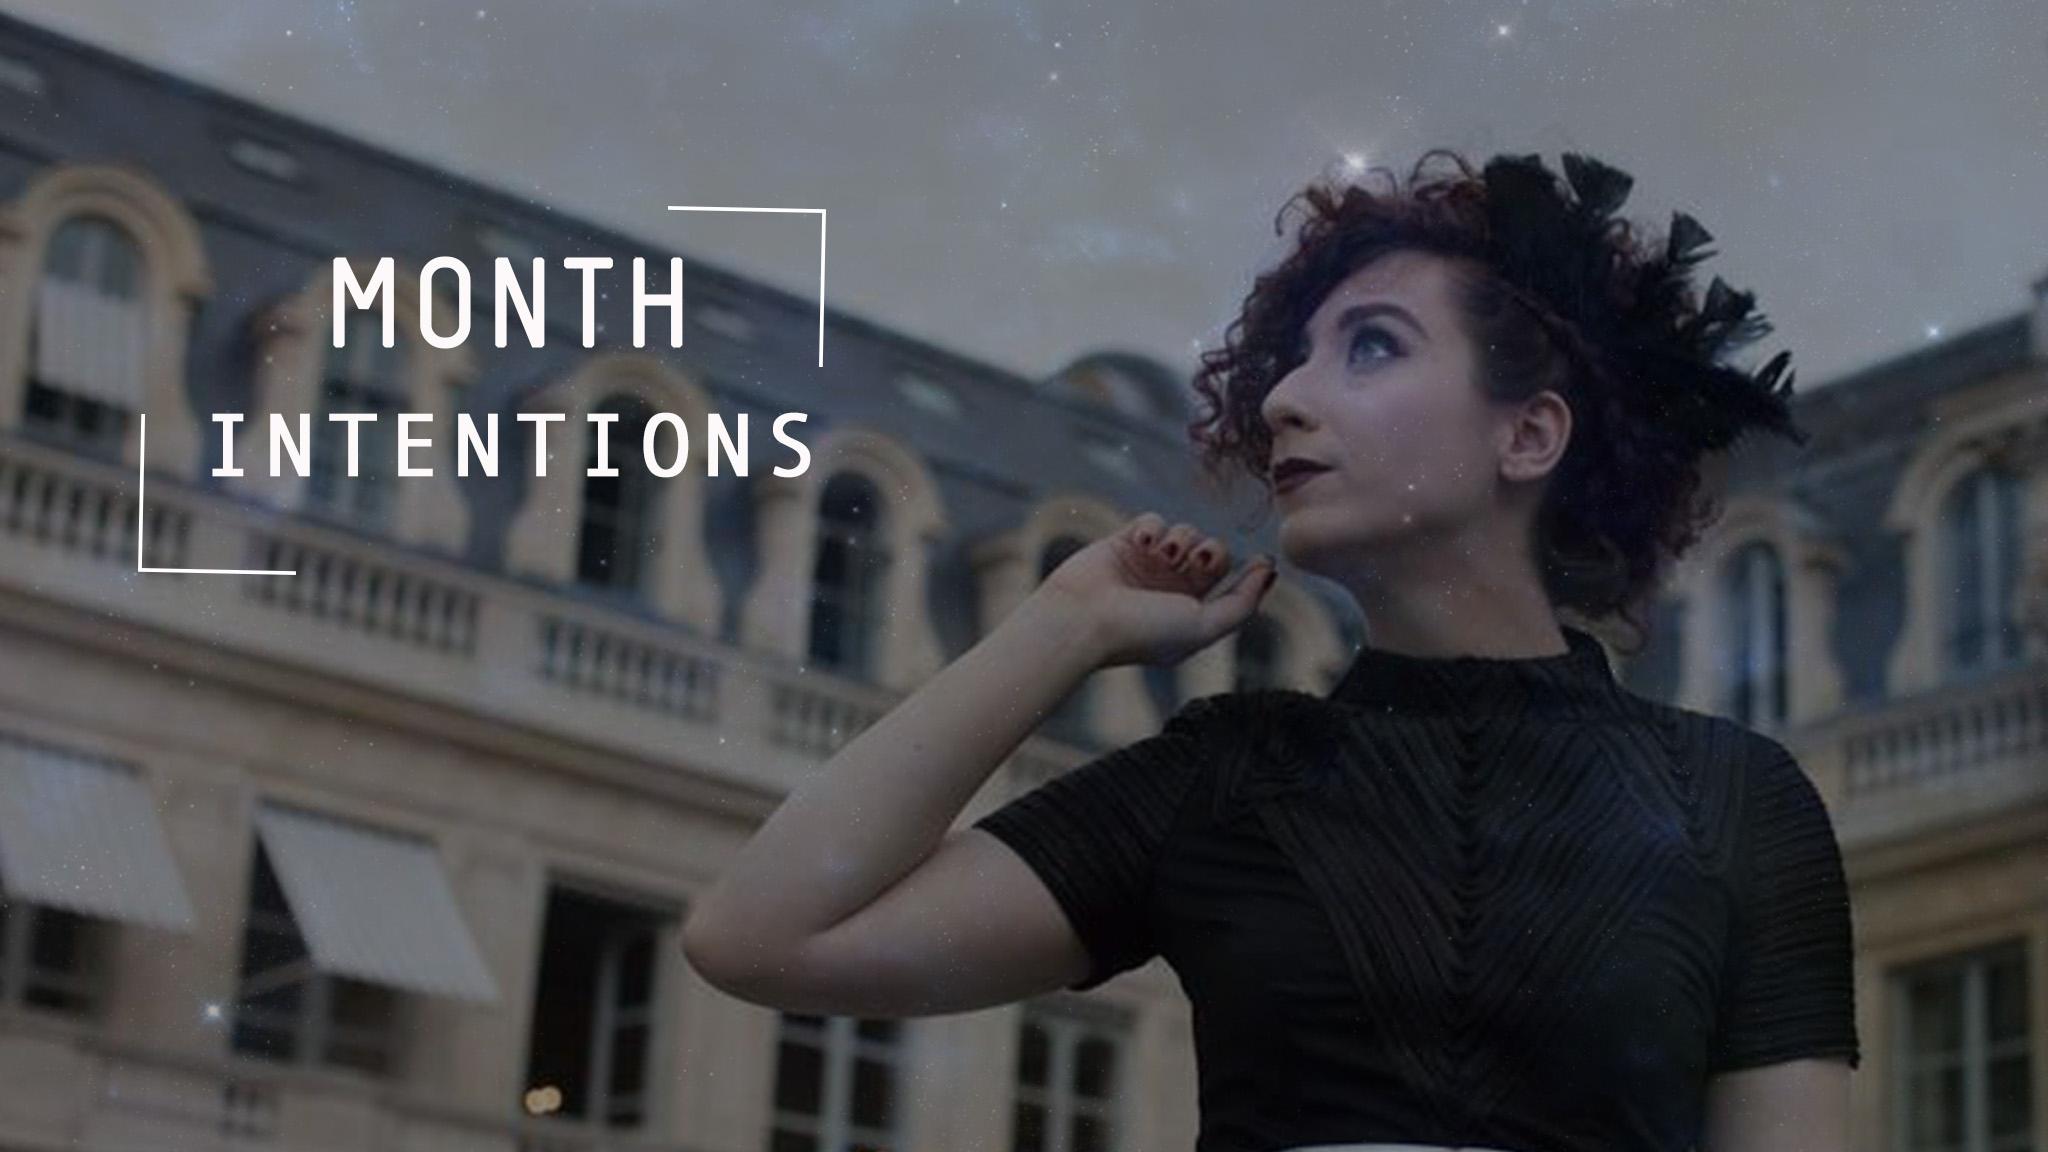 Month Intentions.jpg